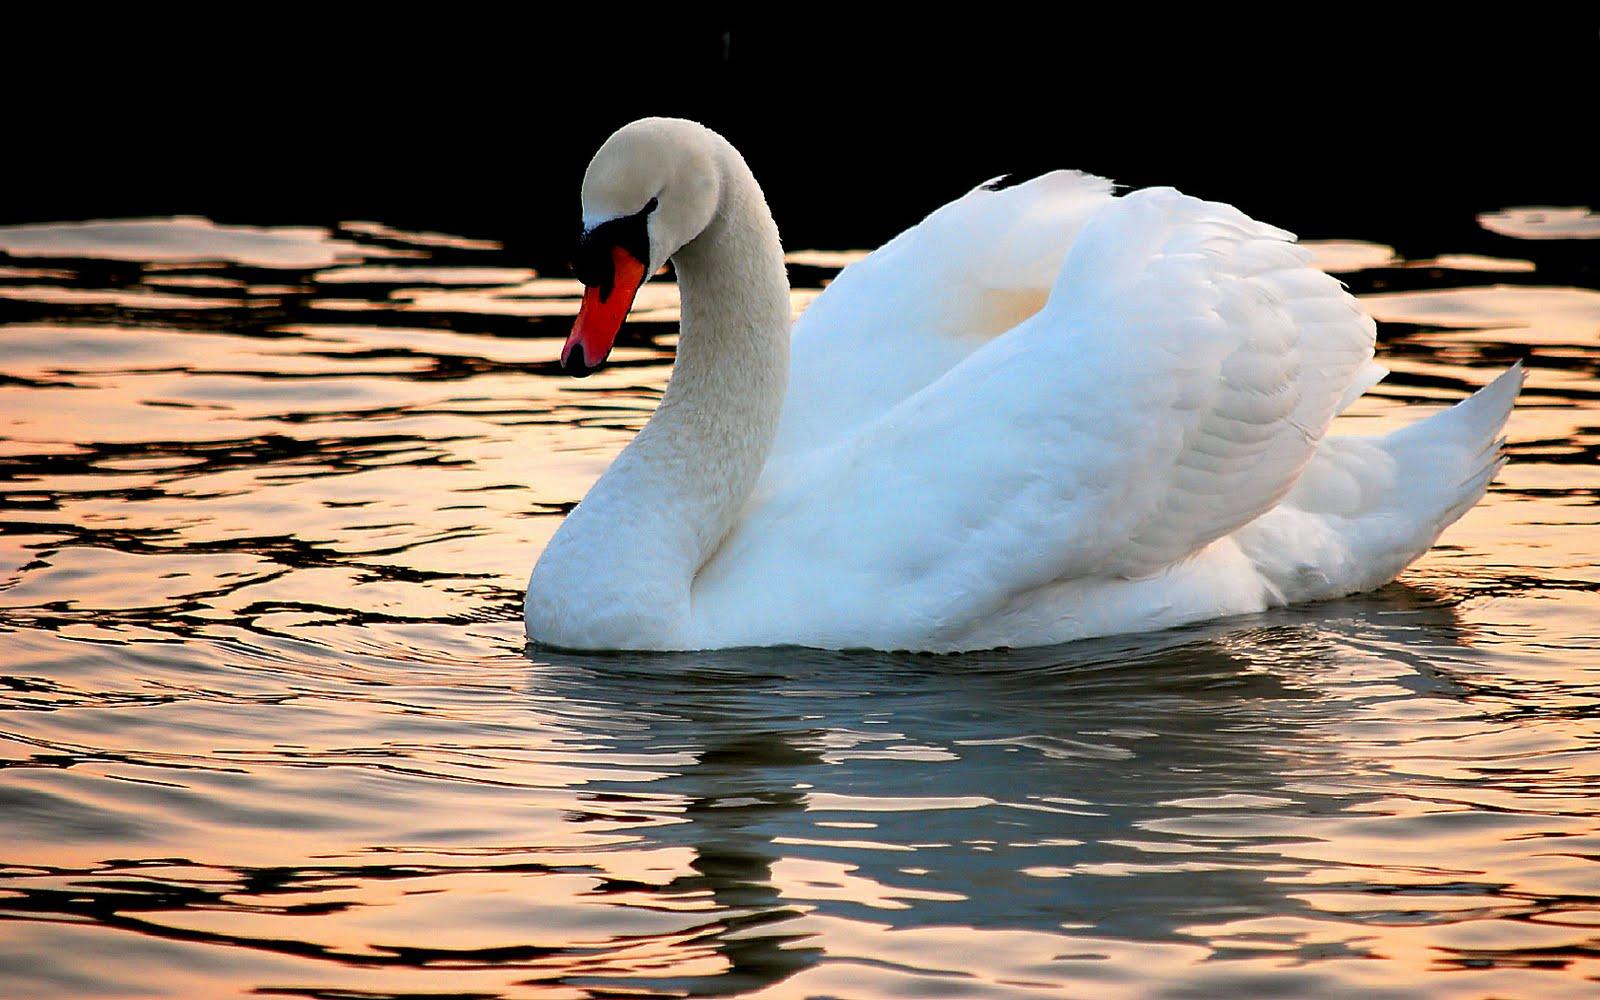 Swan photos hd lake wallpapers desktop wallpapers - Swan wallpapers for desktop ...